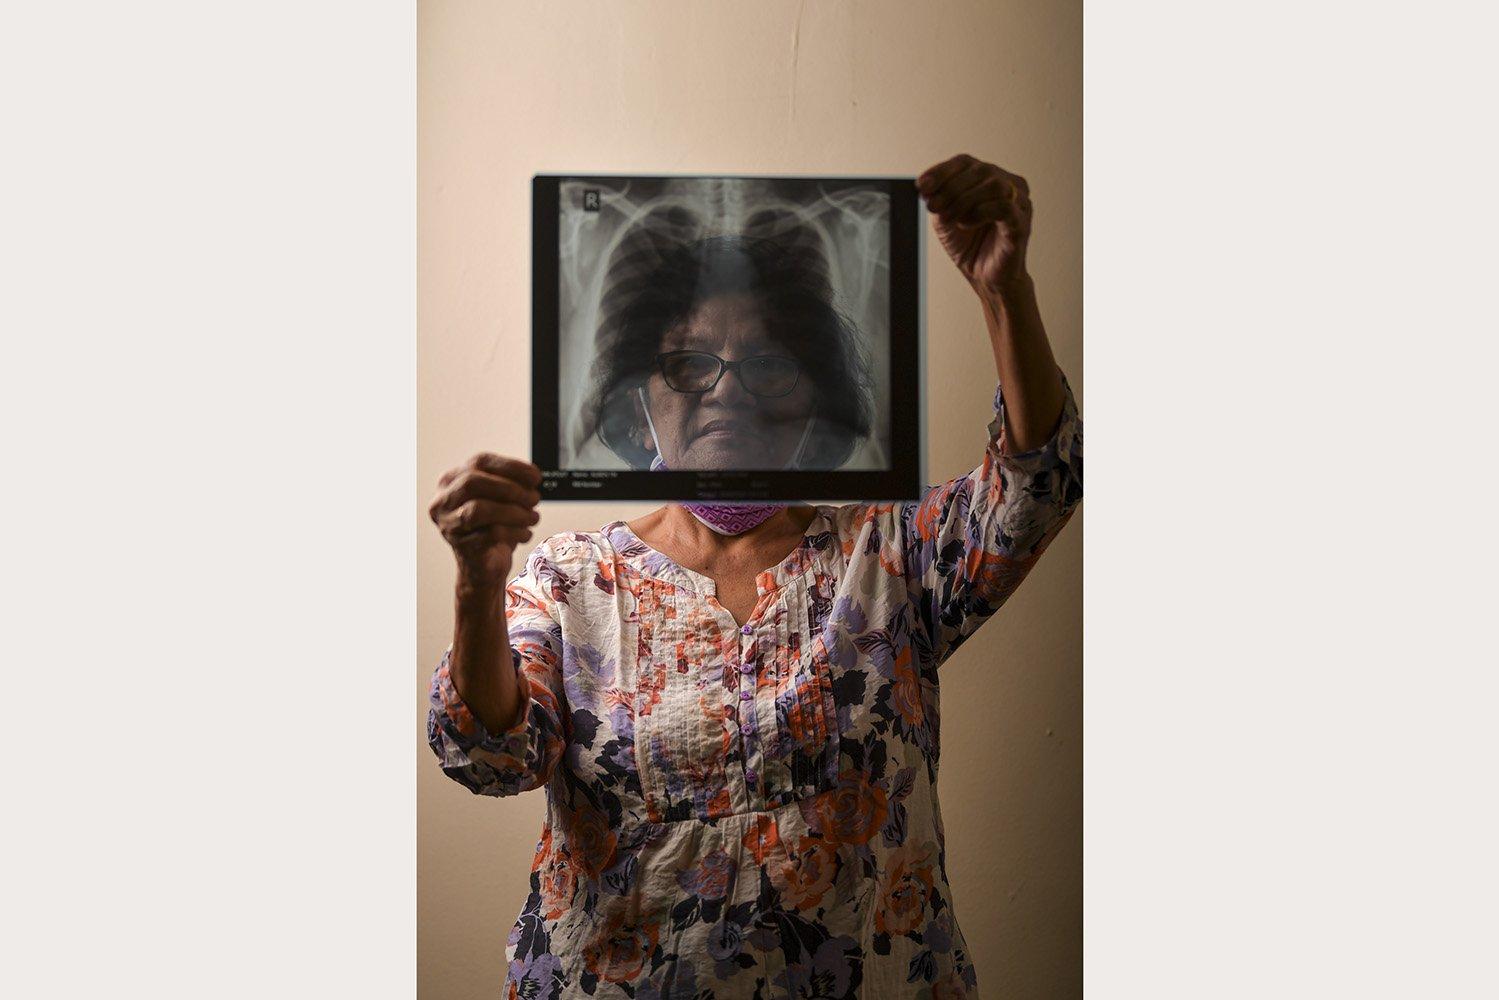 Peberia Tinambunan (69), pensiunan ASN, menunjukkan hasil rontgen paru-paru miliknya di Jakarta. Peberia menjalani isolasi mandiri setelah suaminya dinyatakan positif terinfeksi corona.\r\n